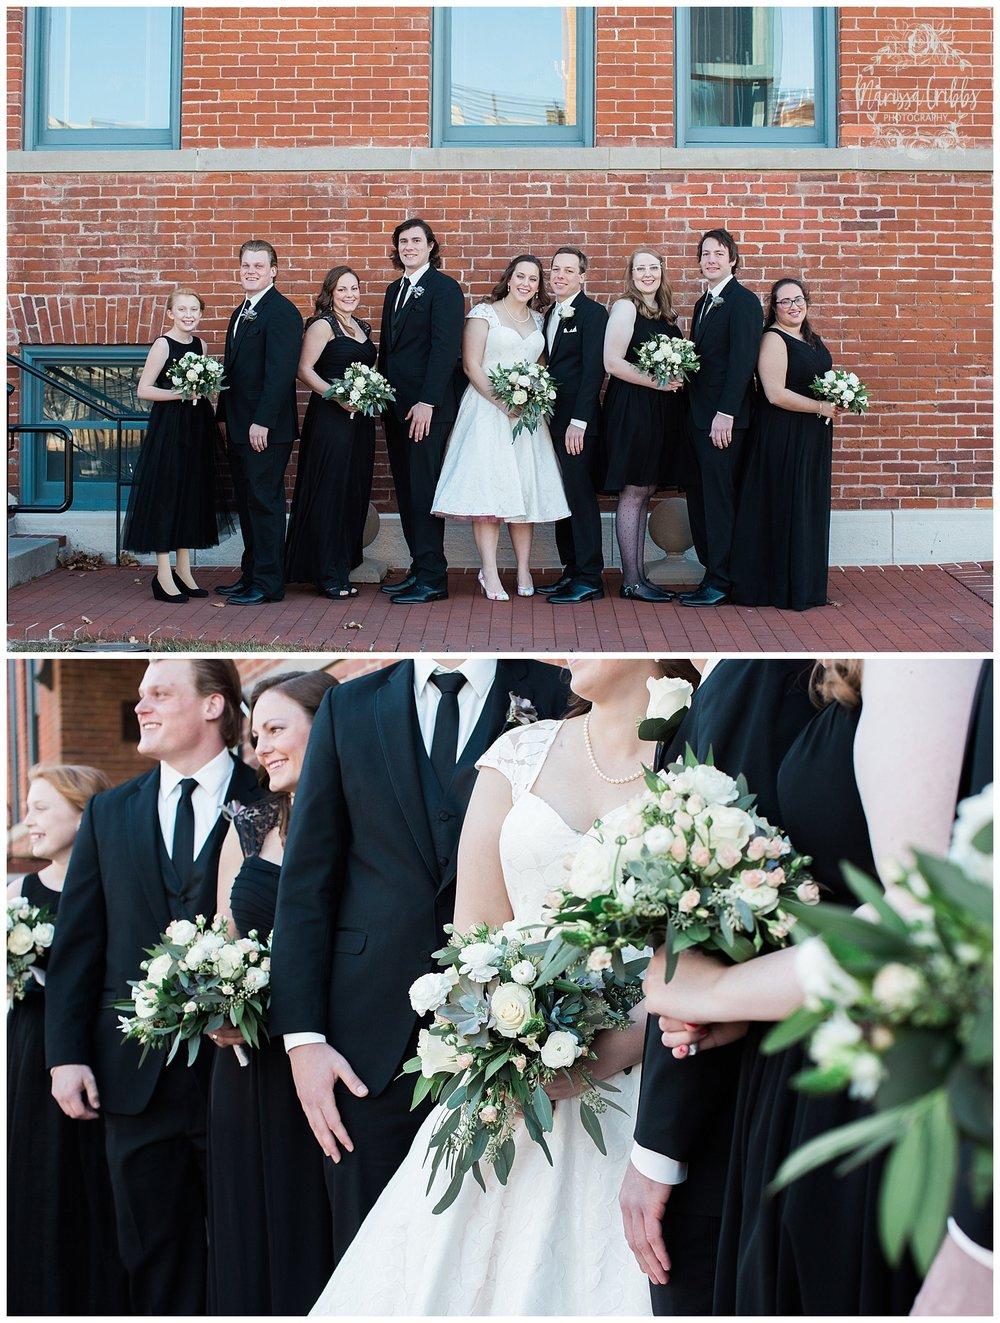 Webster House KC Wedding | KC Wedding Photographer | Marissa Cribbs Photography_0049.jpg